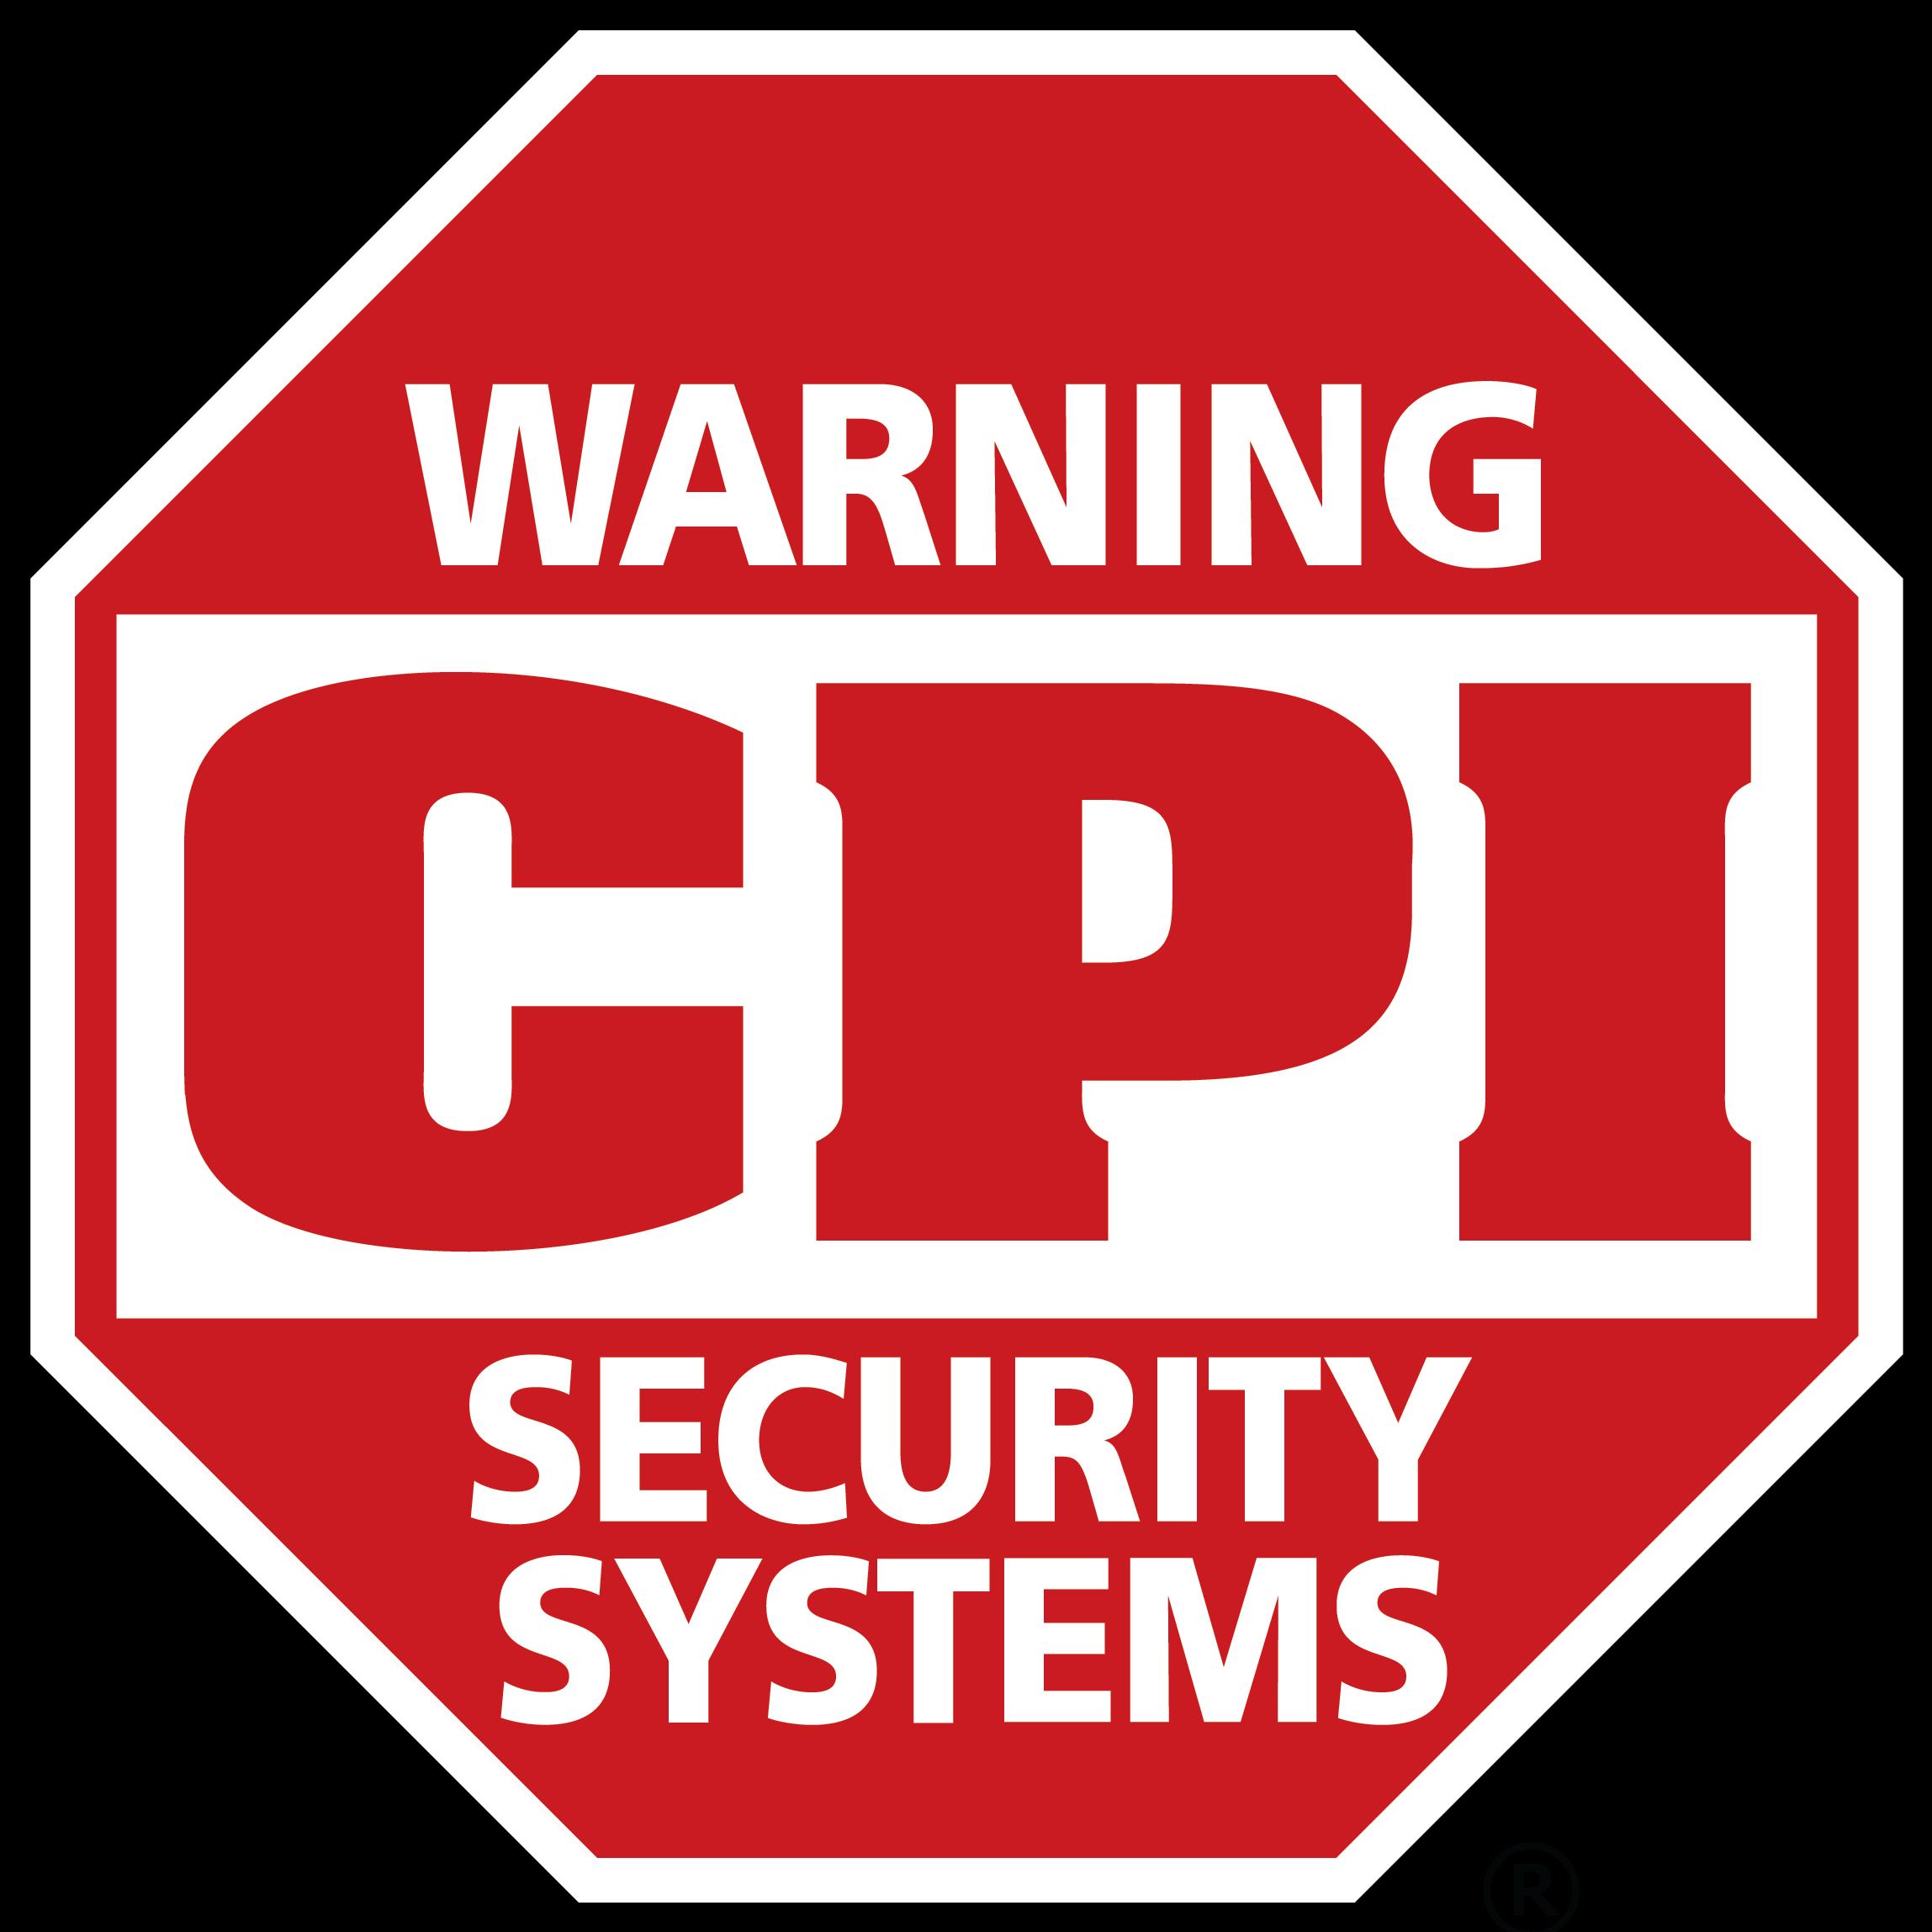 CPI Security